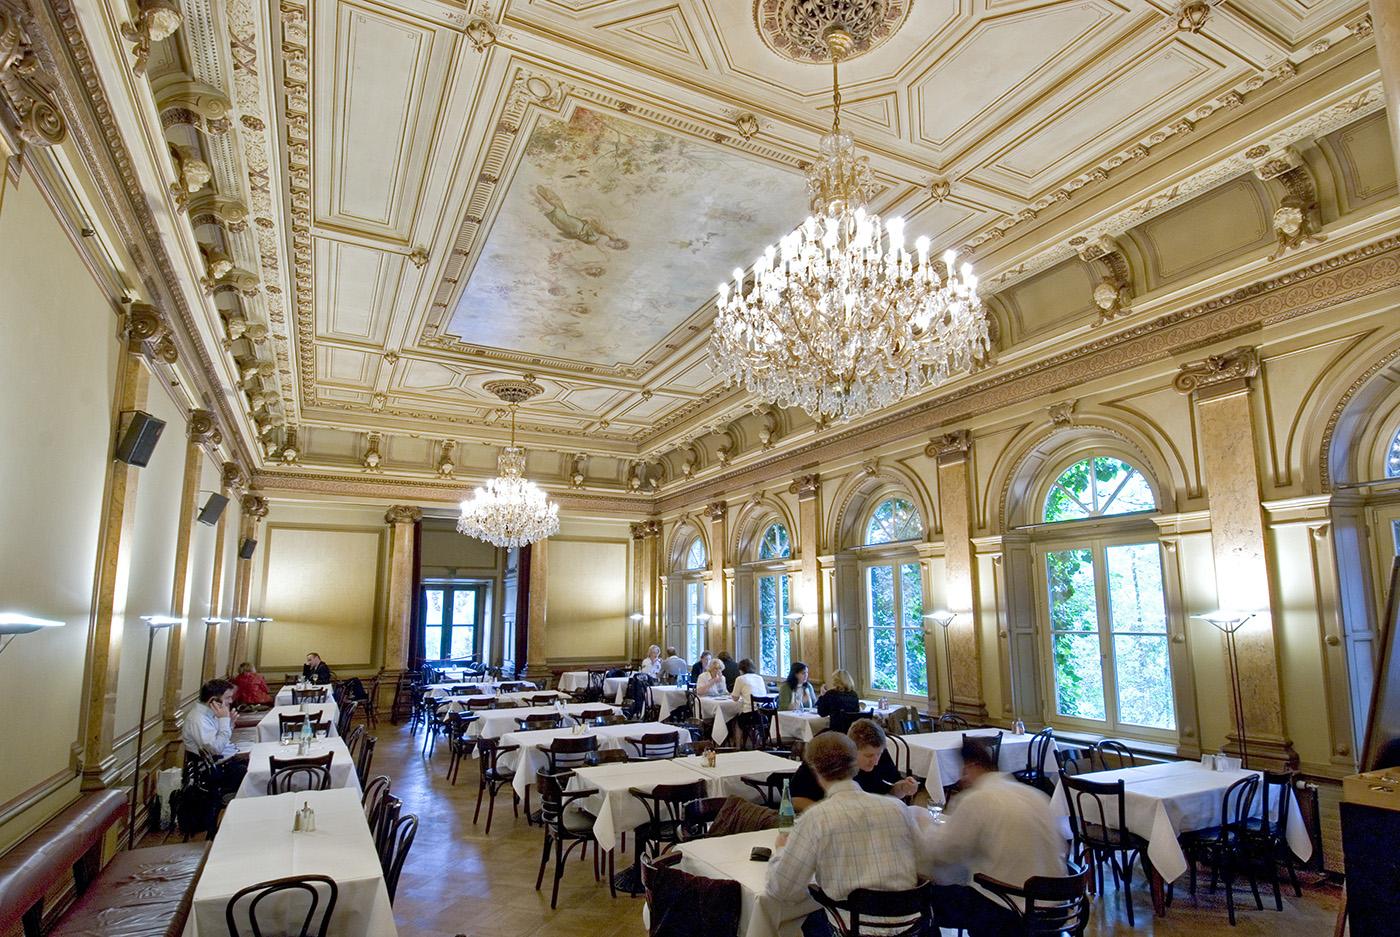 Literaturhauscafe. Cafe des Literaturhauses